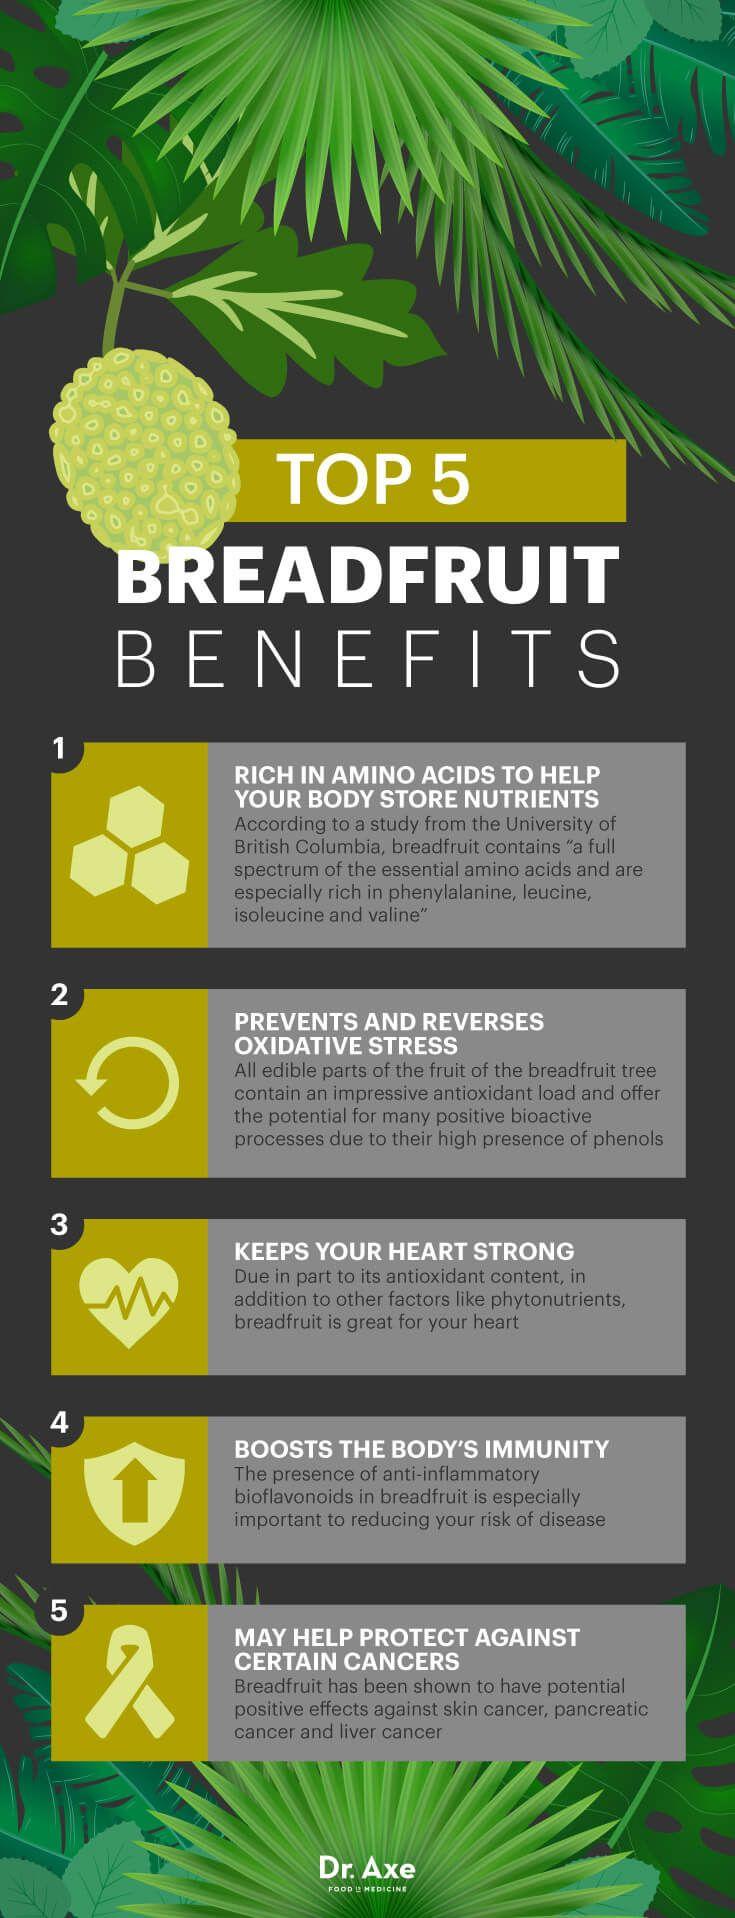 Breadfruit benefits - Dr. Axe http://www.draxe.com #health #holistic #natural